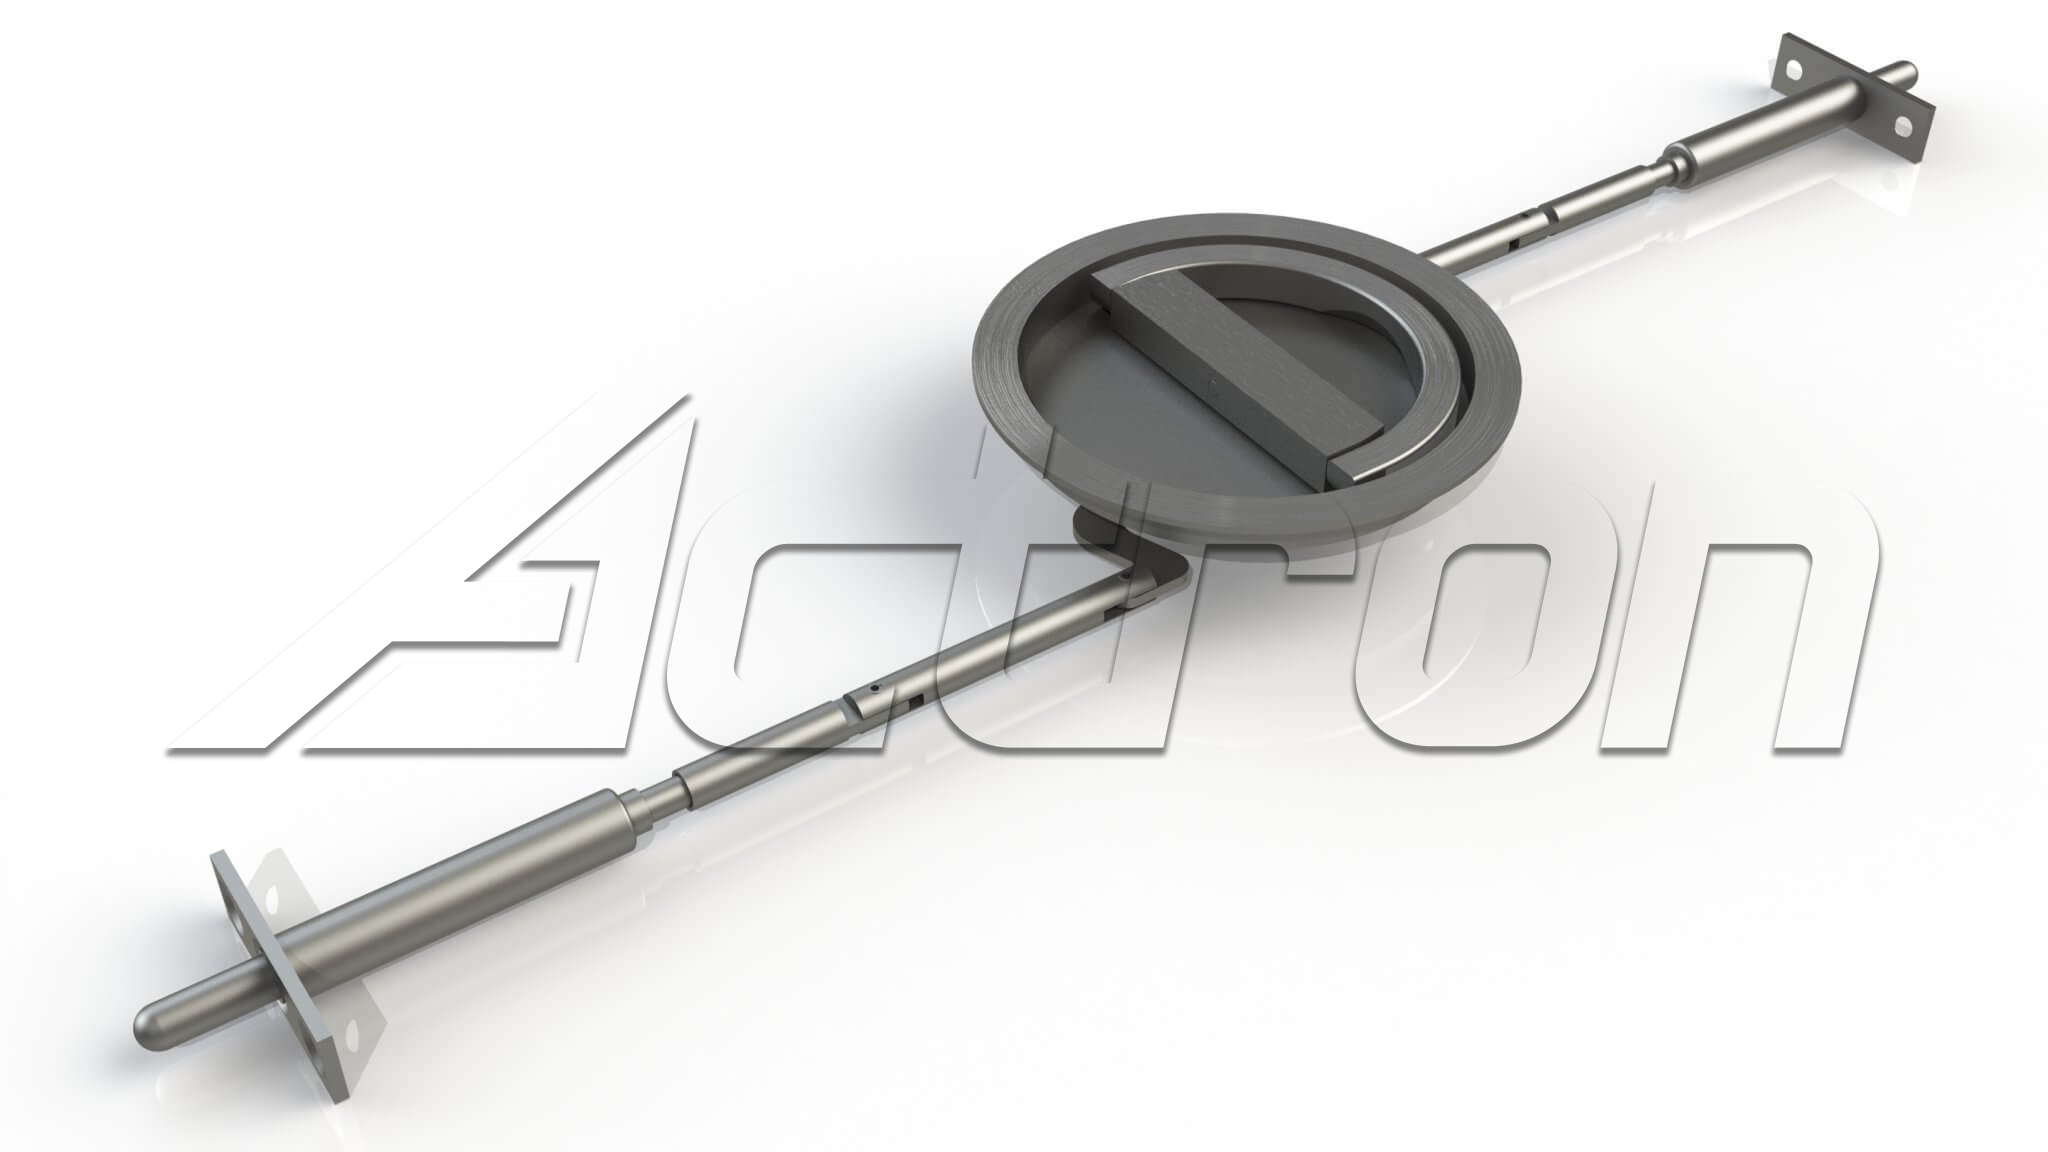 door-bolting-system-8211-d-handle-5354-a39144.jpg